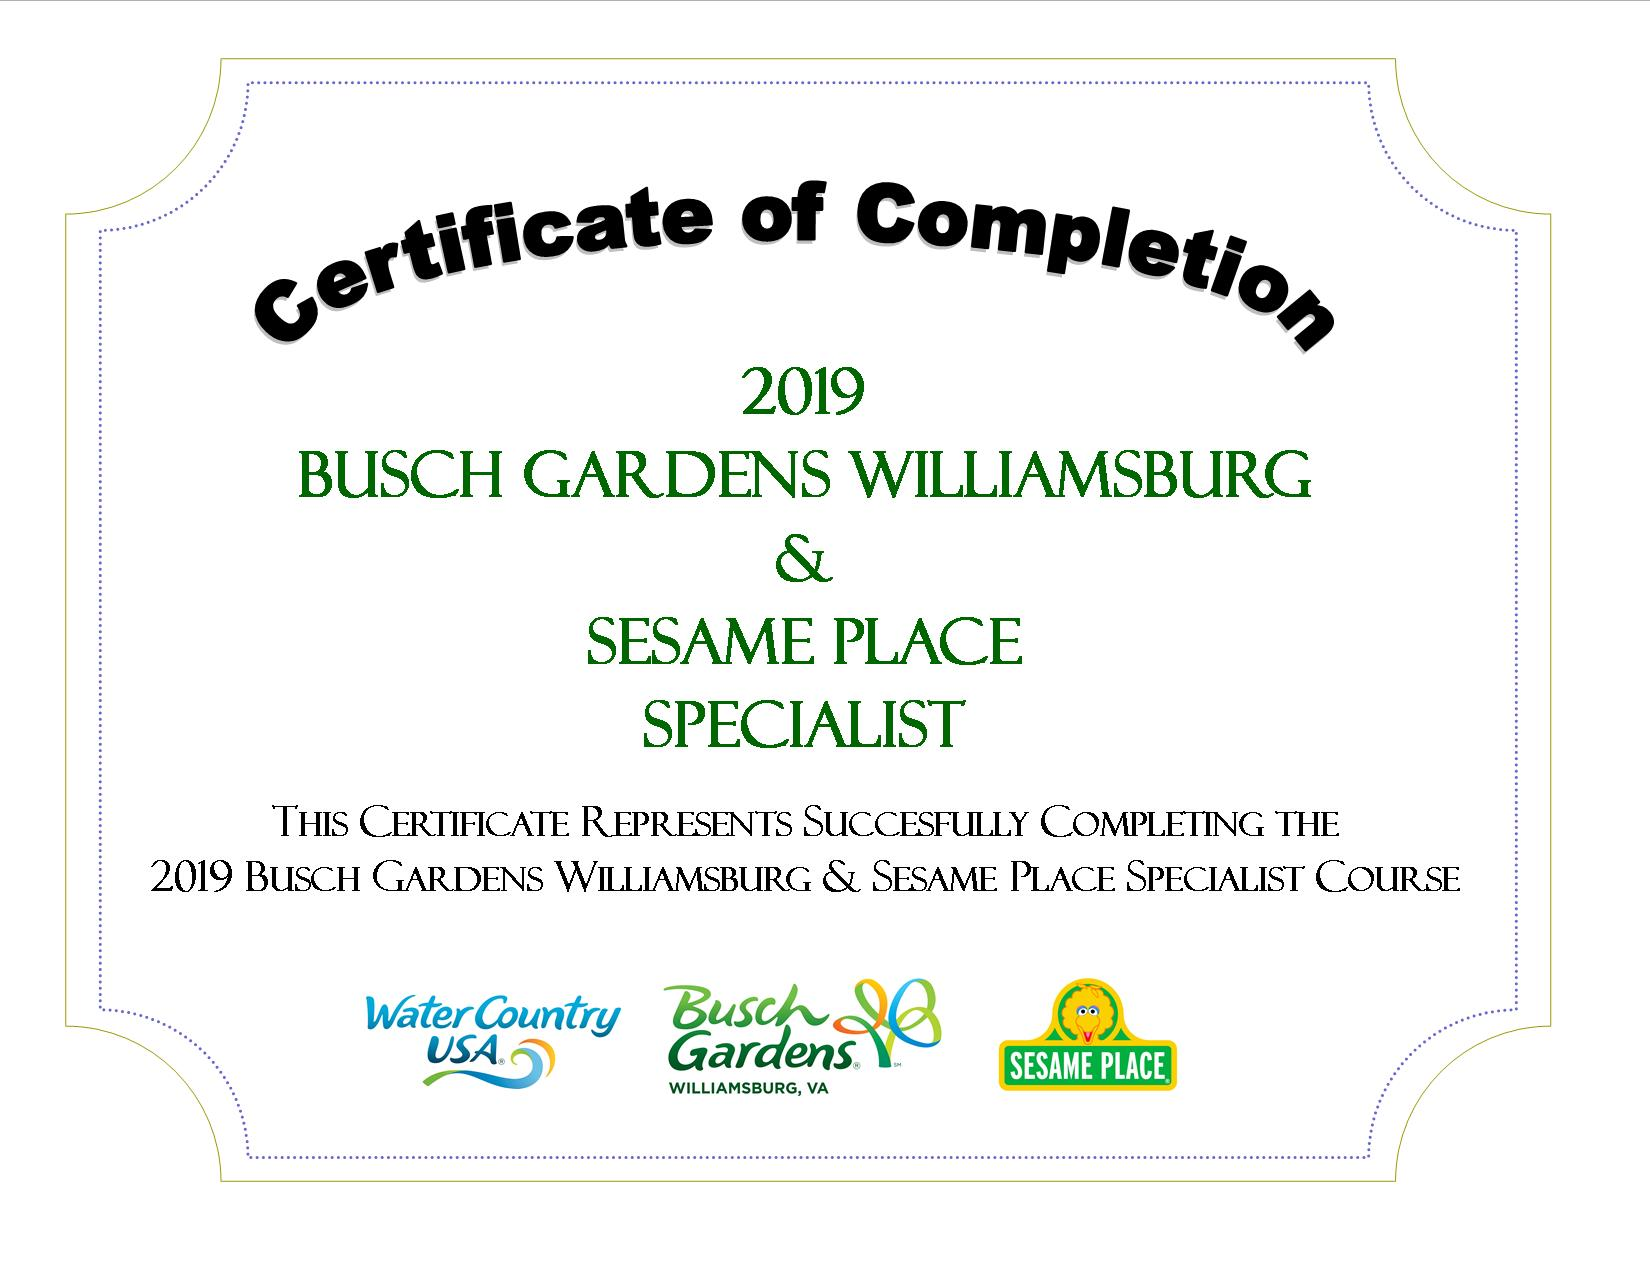 BGW_SPL_Certificate.jpg